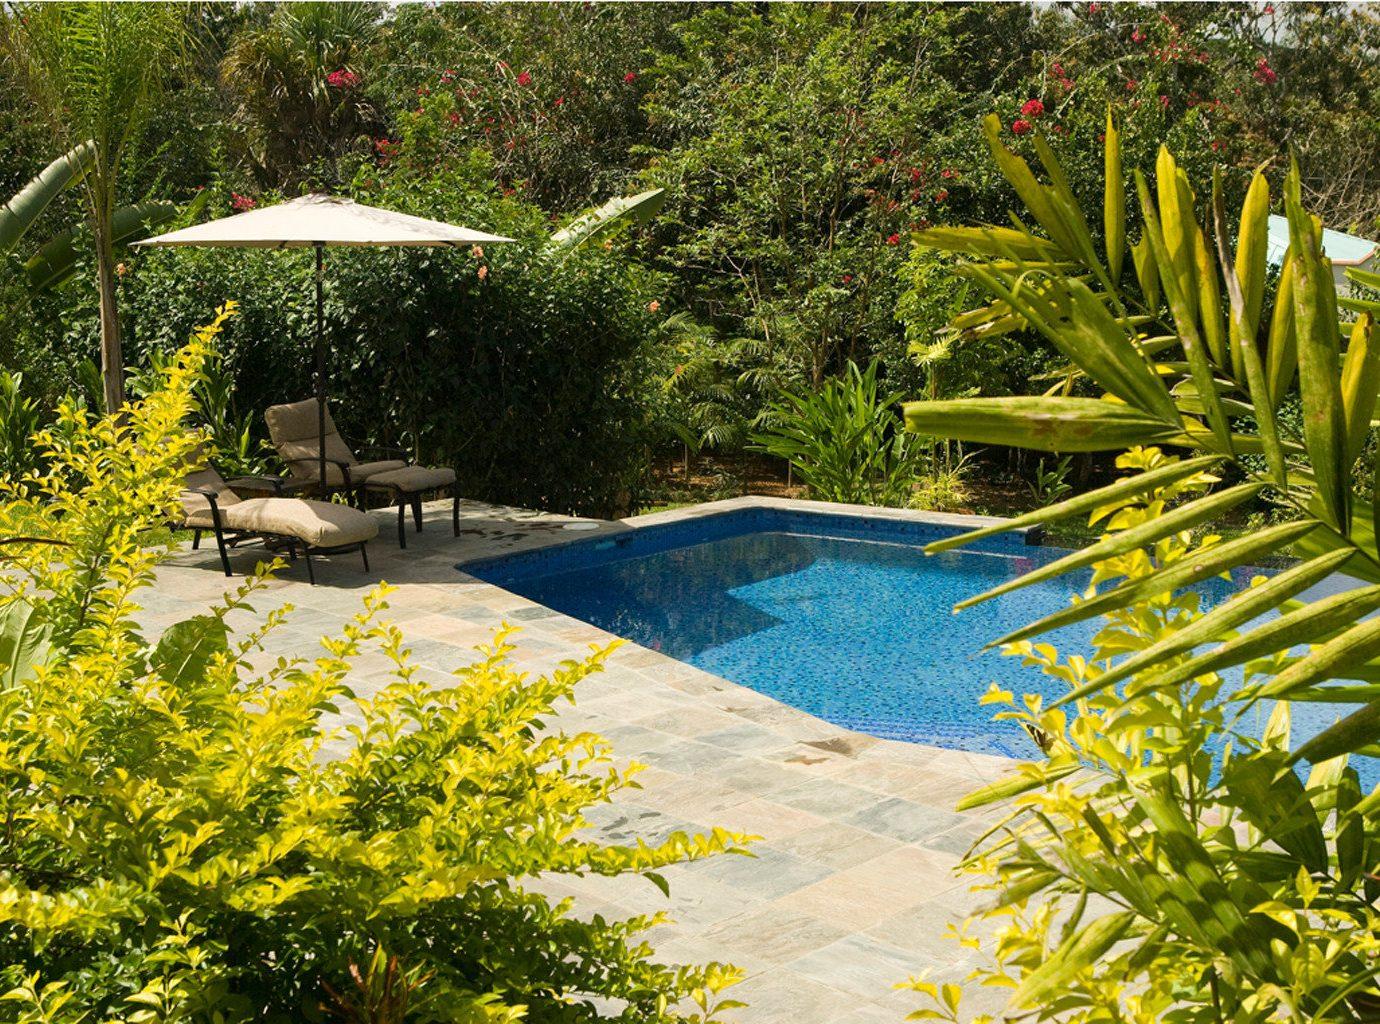 Pool At Ka'Ana Boutique Resort And Spa In San Ignacio, Cayo District